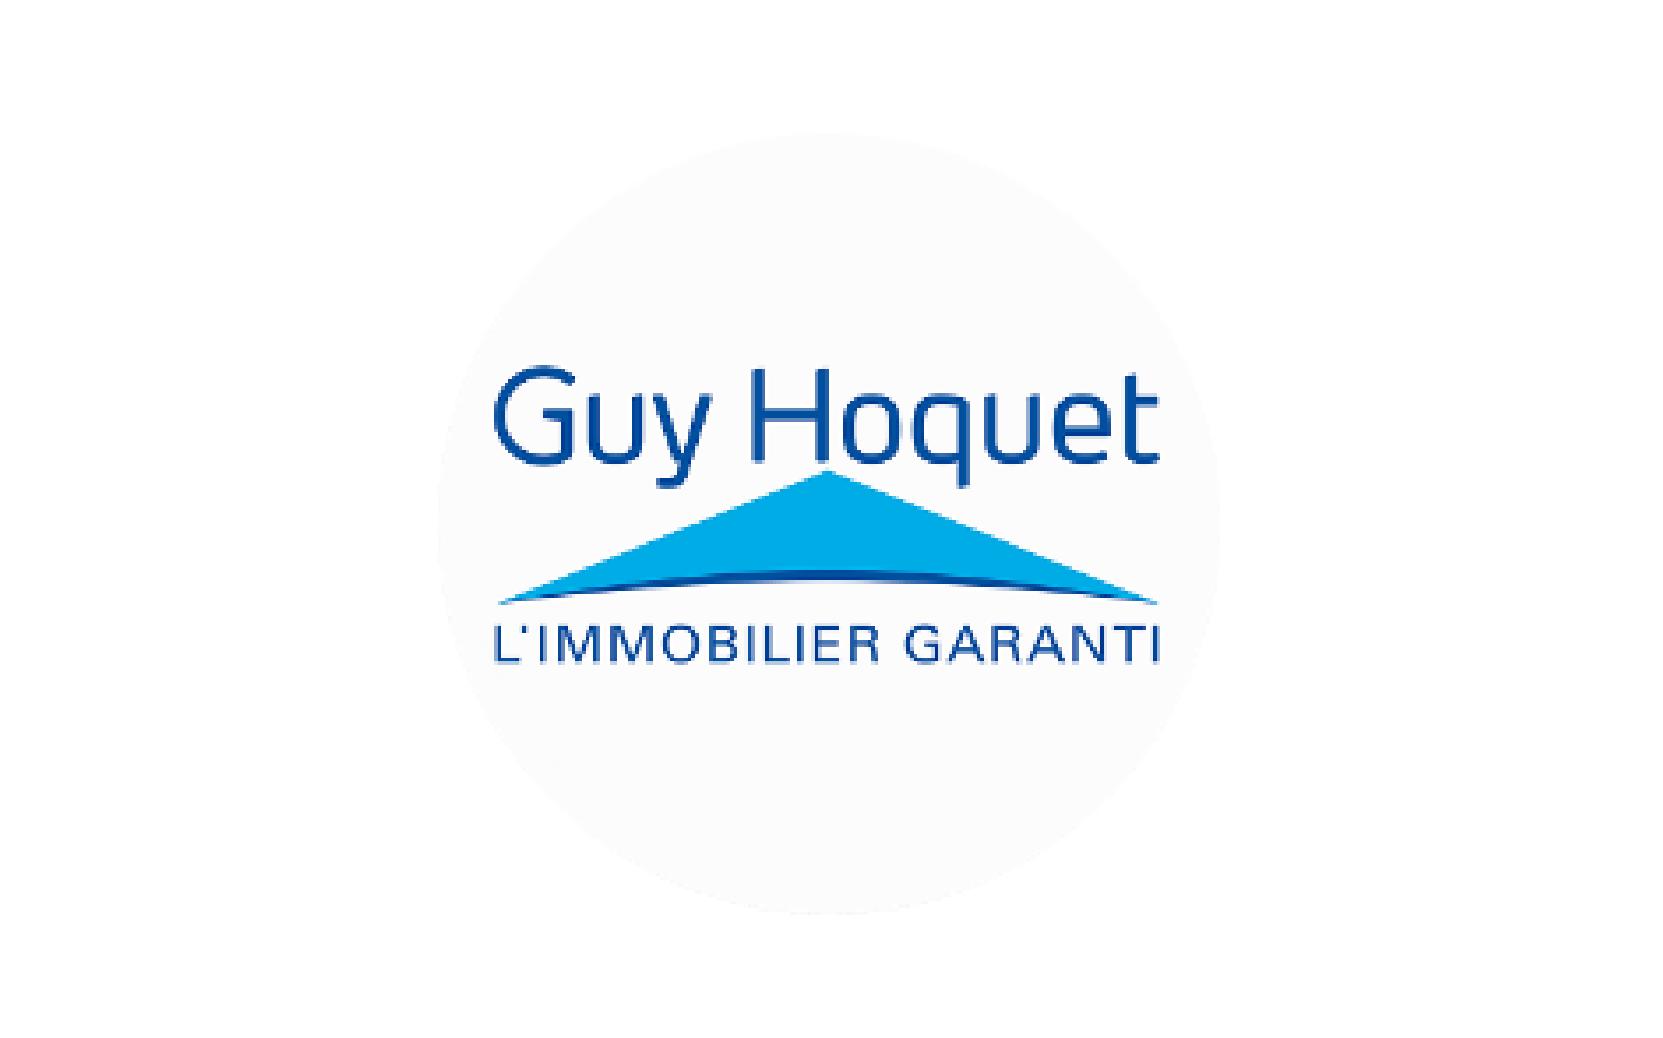 Logo de Guy Hoquet